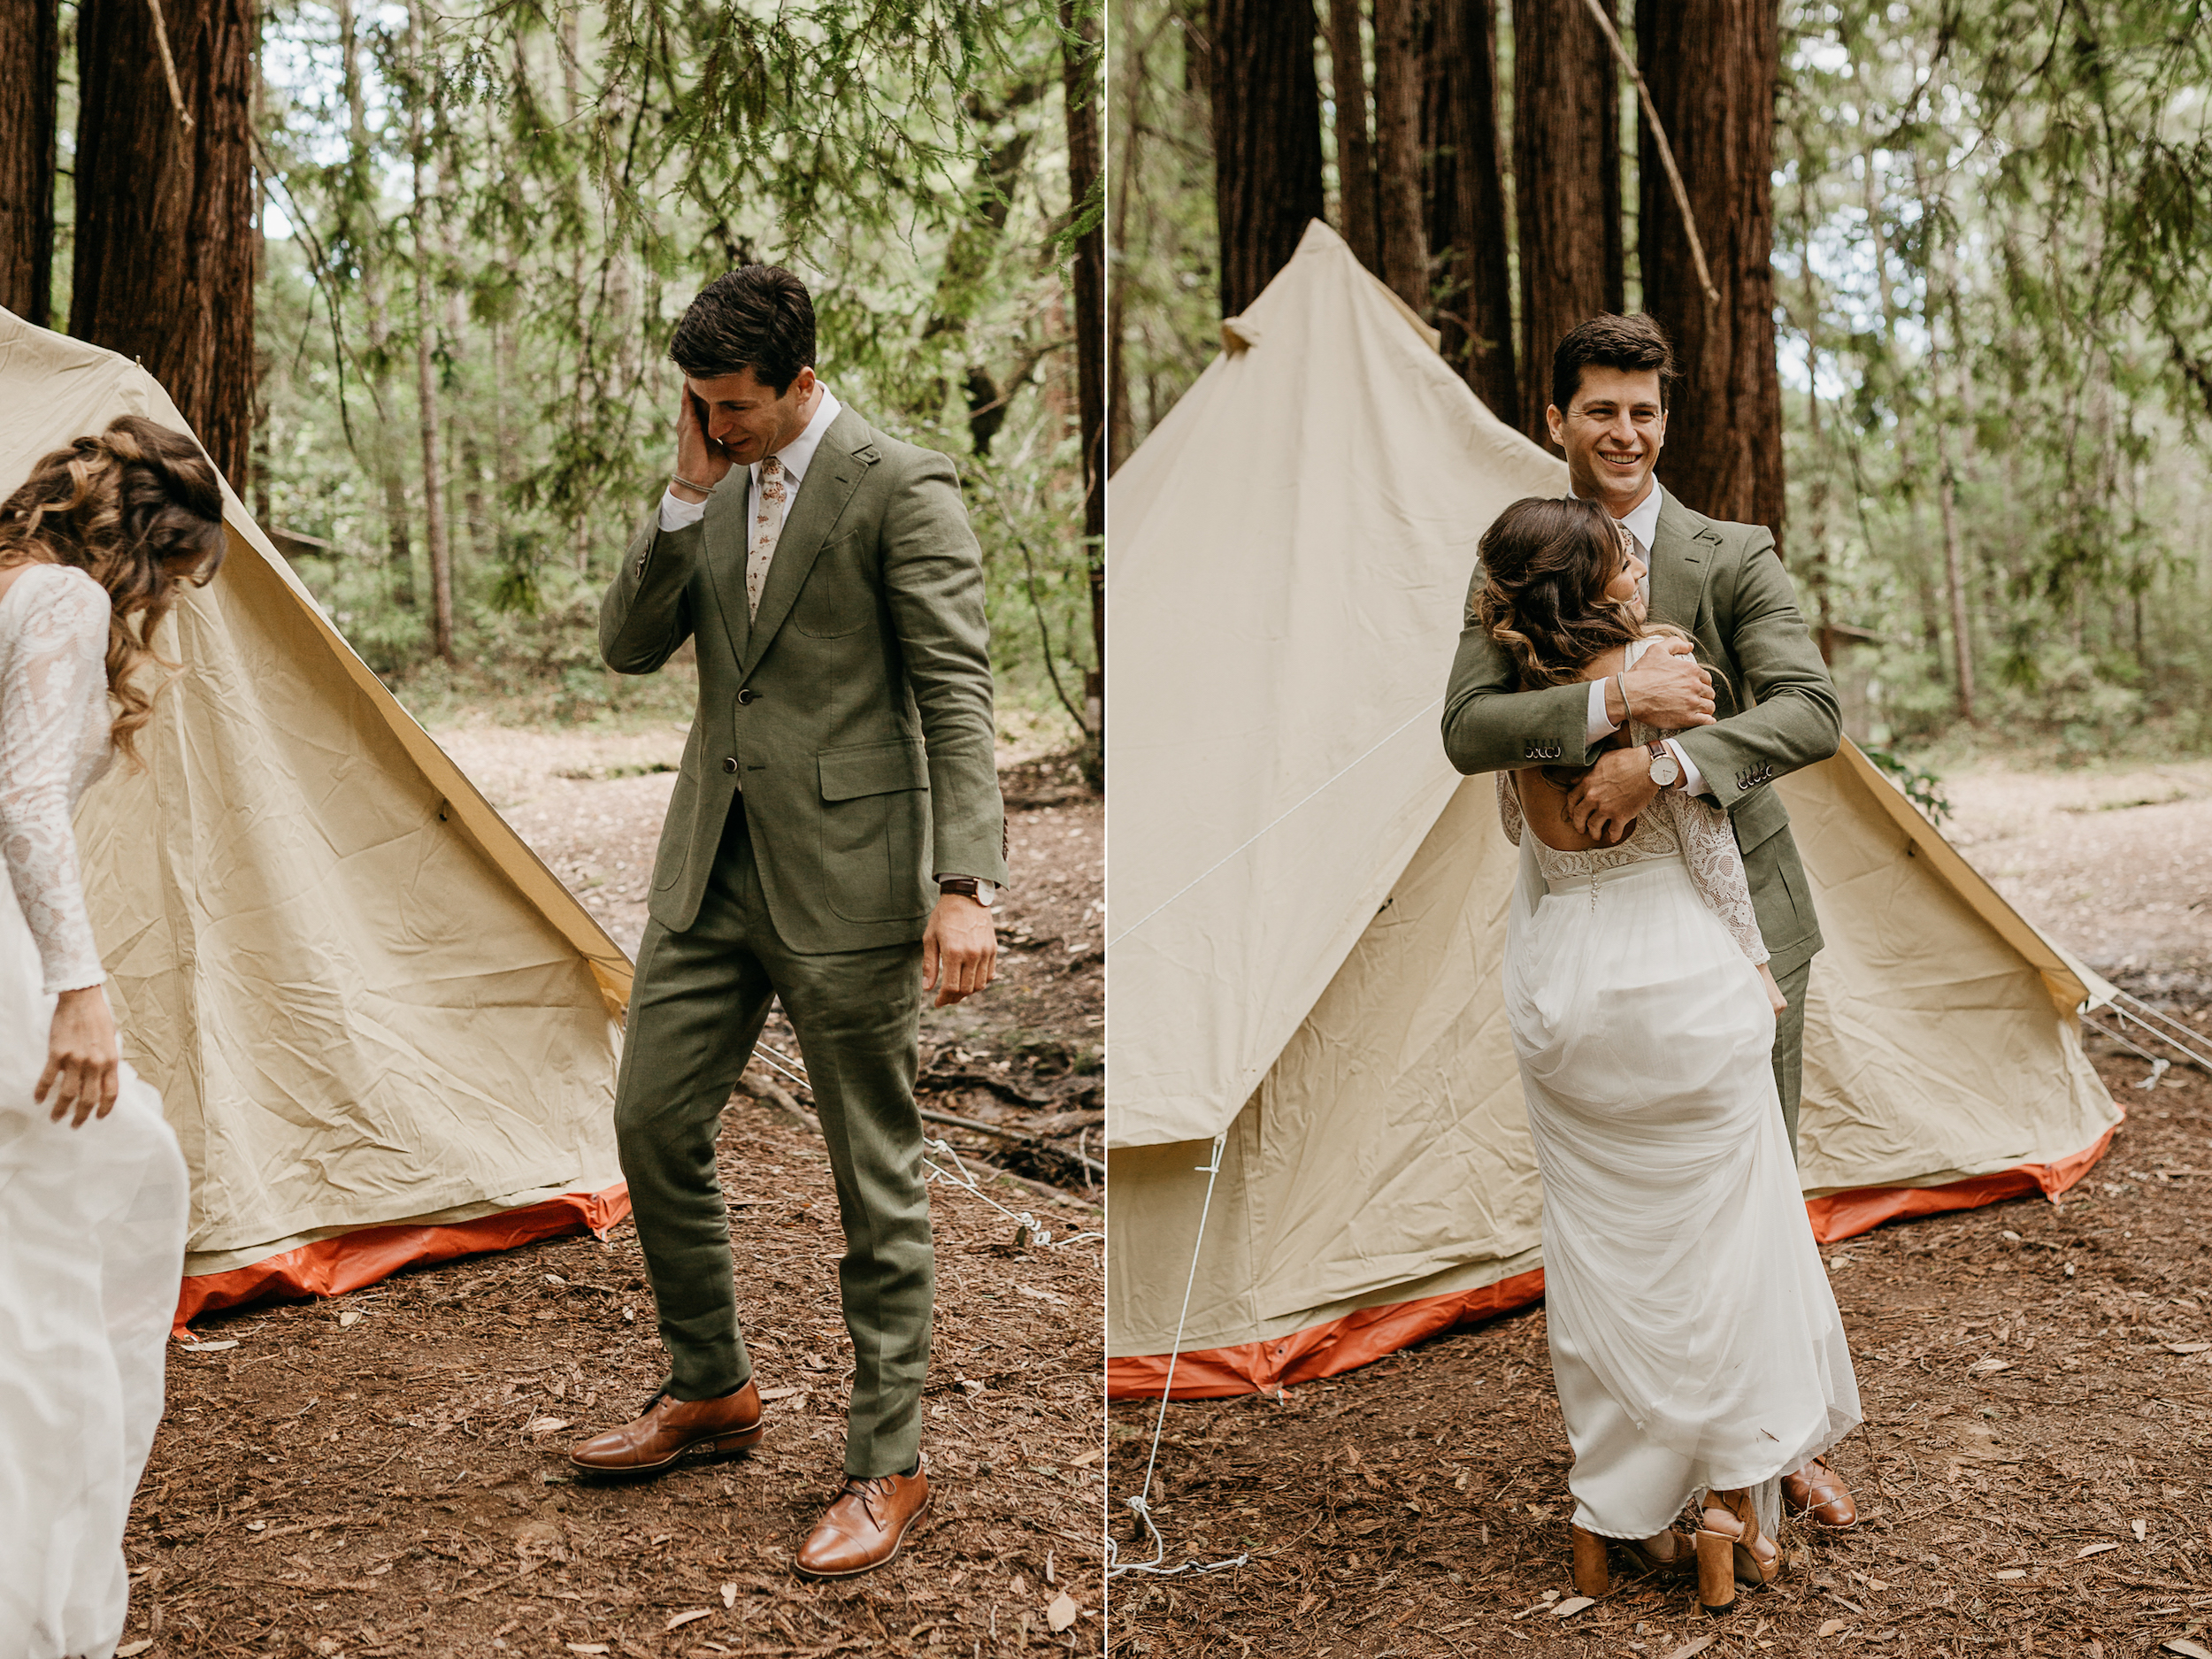 camp campbell-wedding-photographer010.jpg